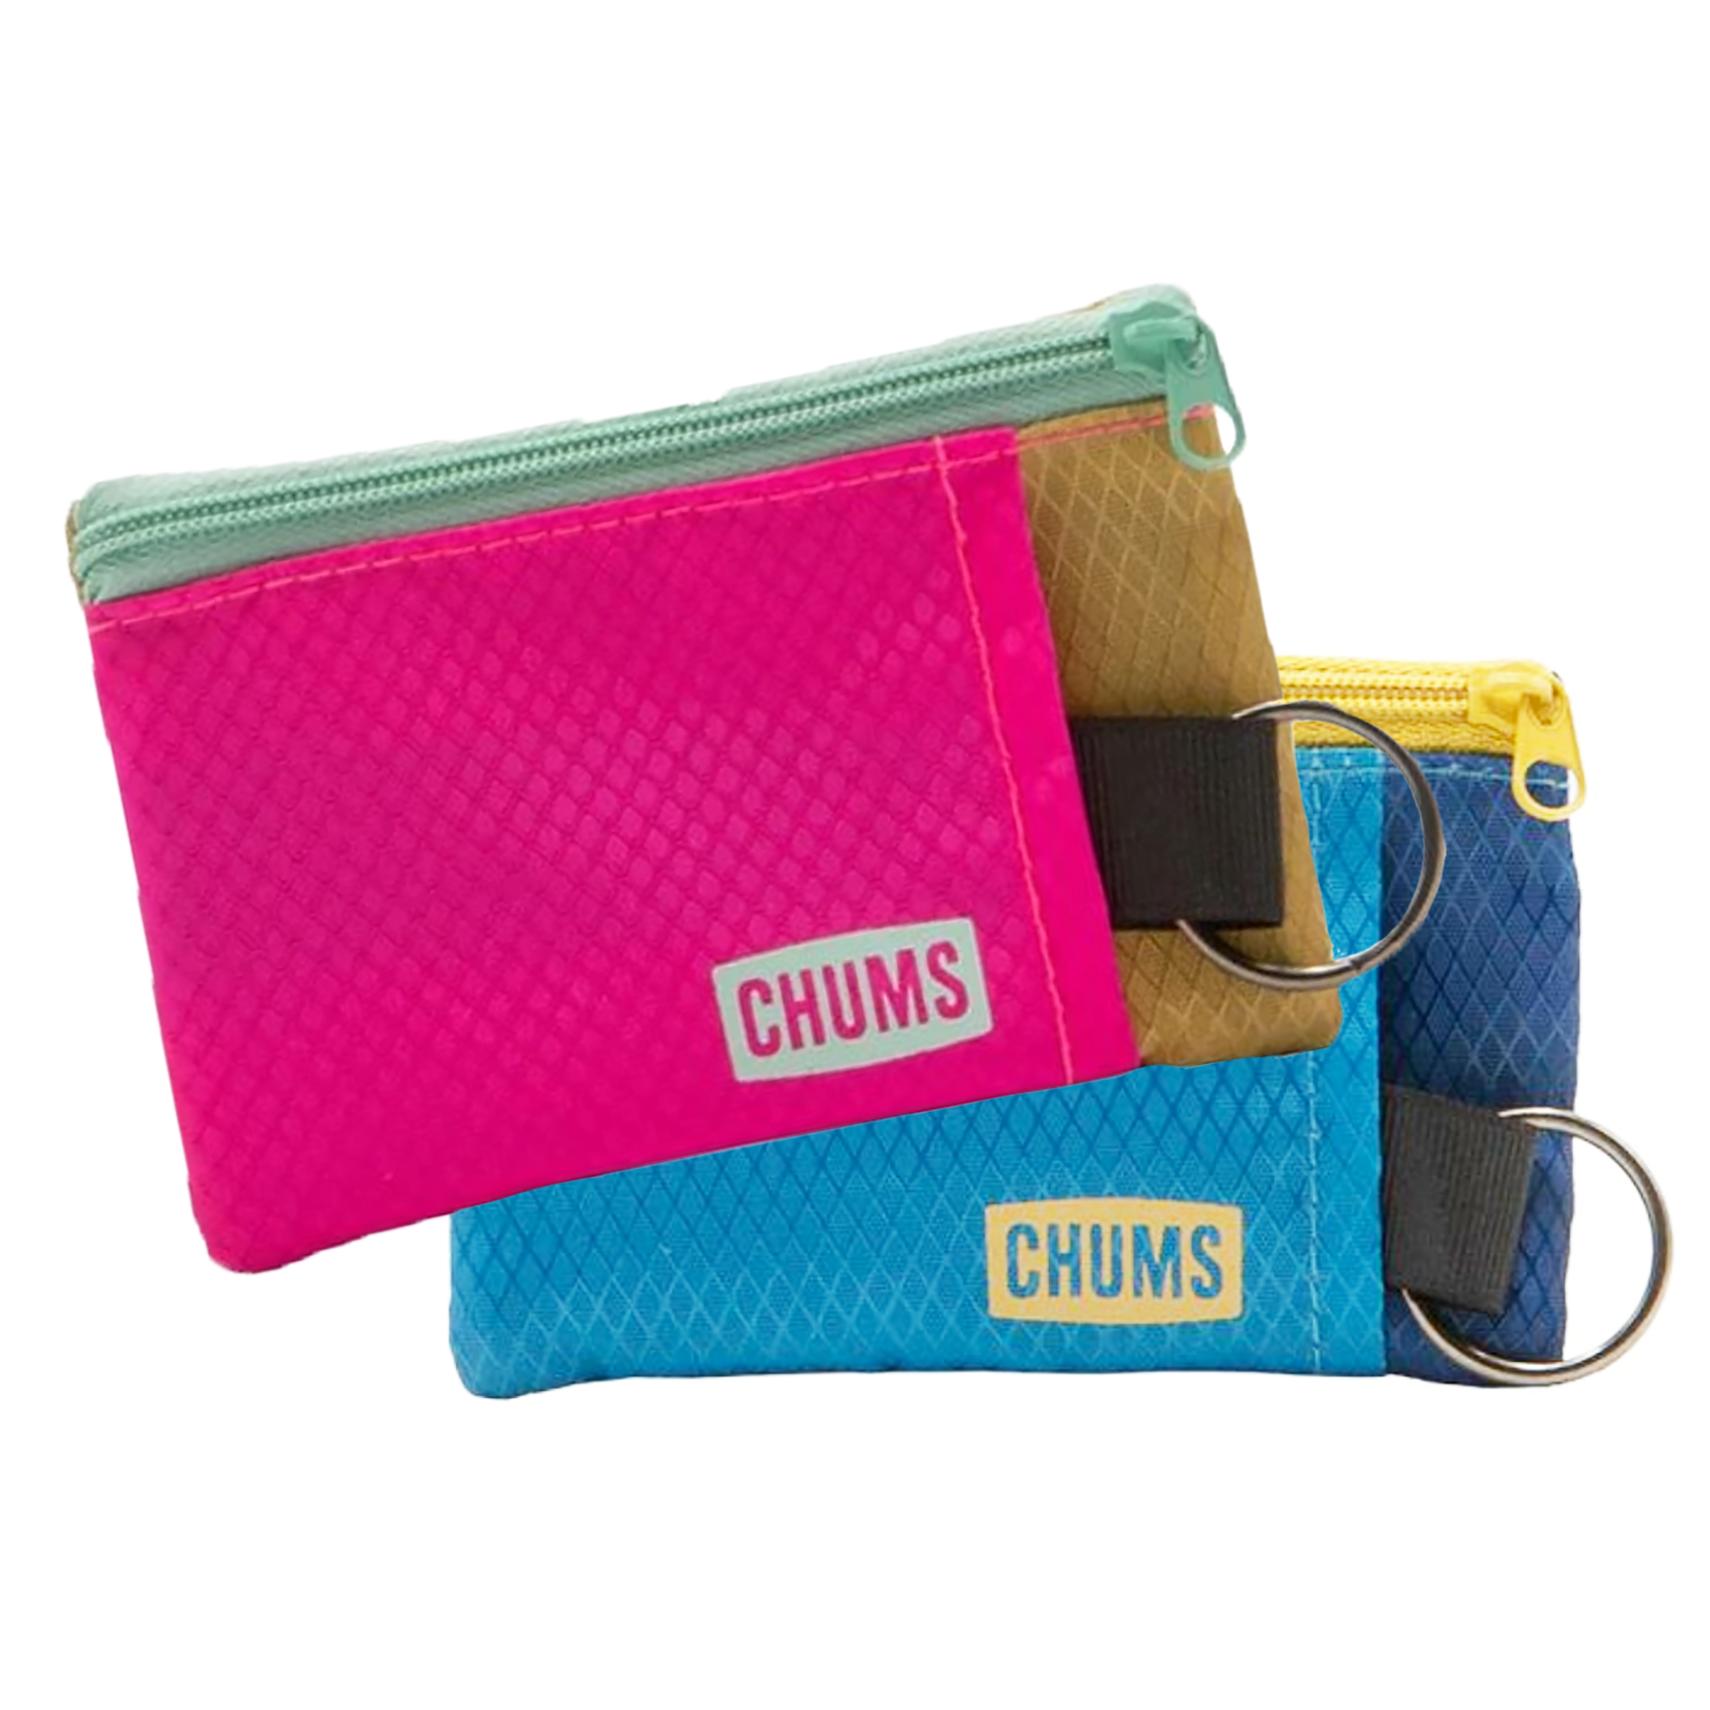 Surfshorts Wallet Tri-color, Assorted-1